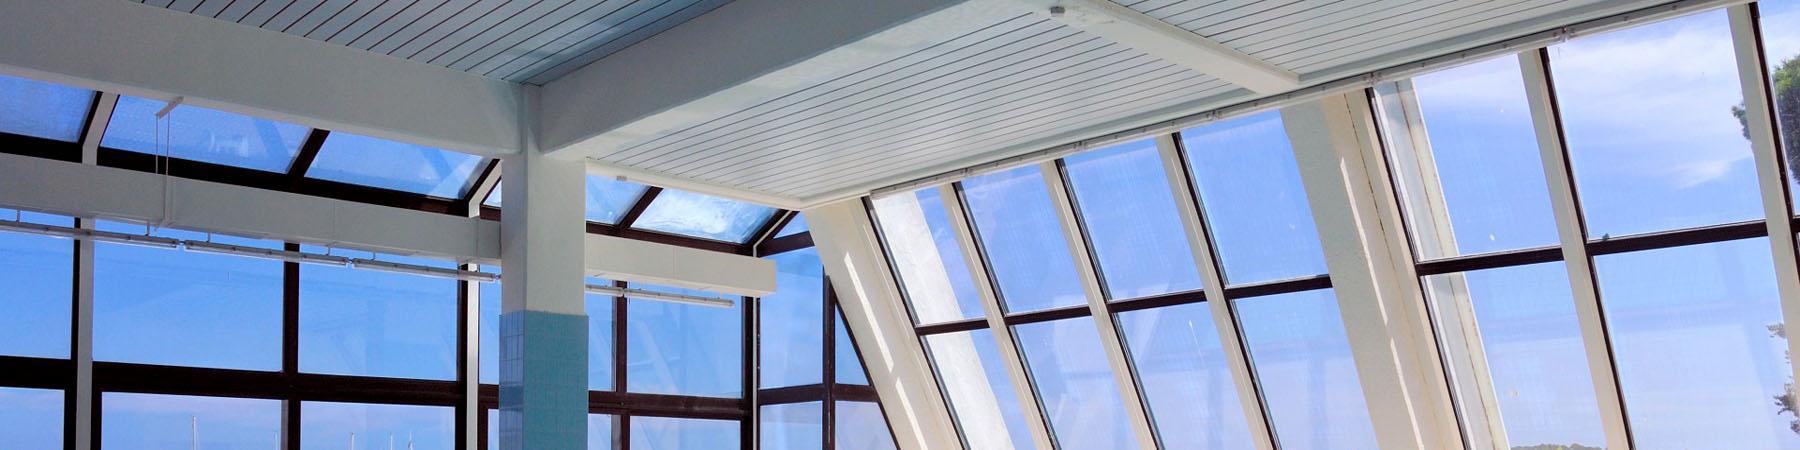 internal-windows